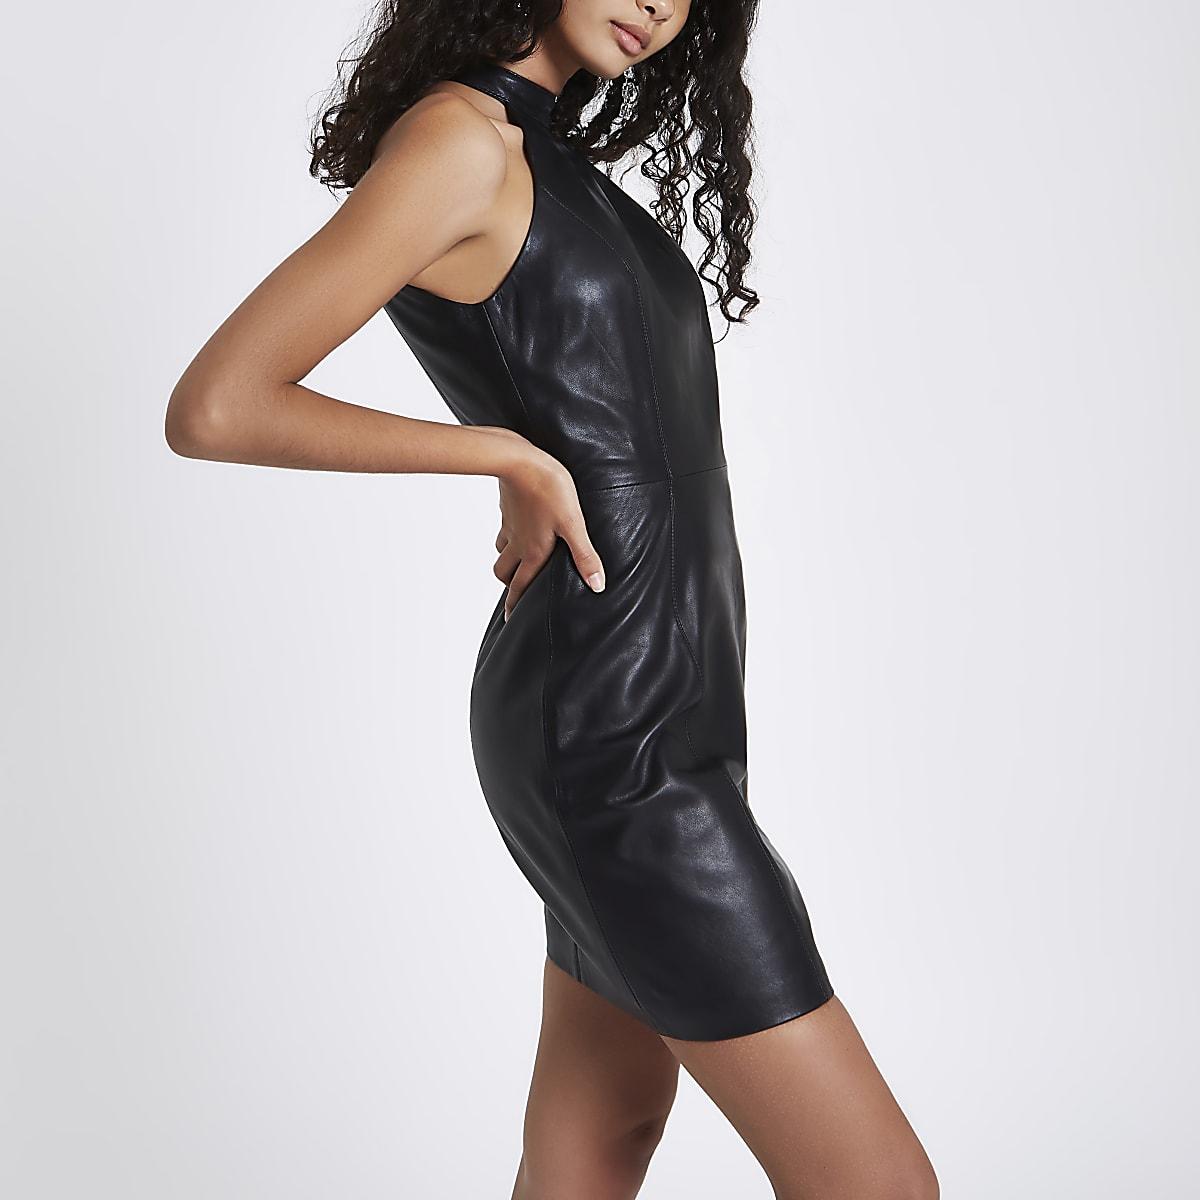 Black leather A line choker neck mini dress